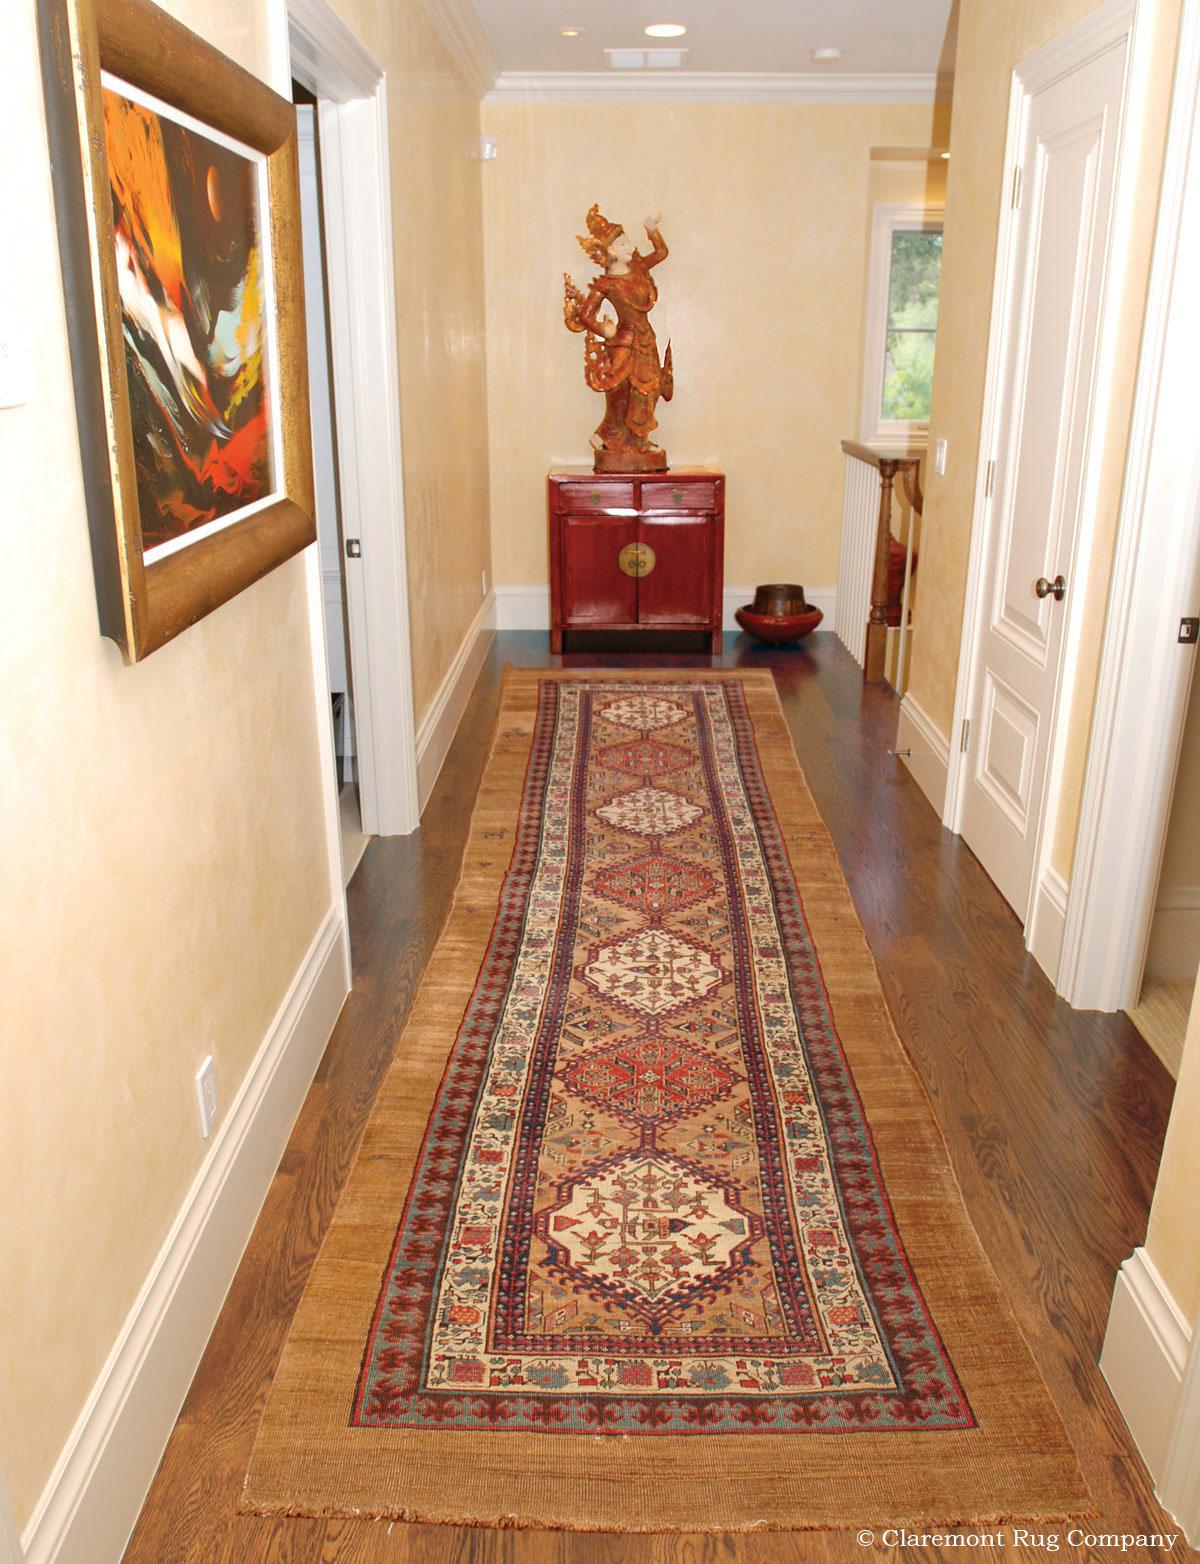 Antique Camelhair Rug In Runner Size Hallway